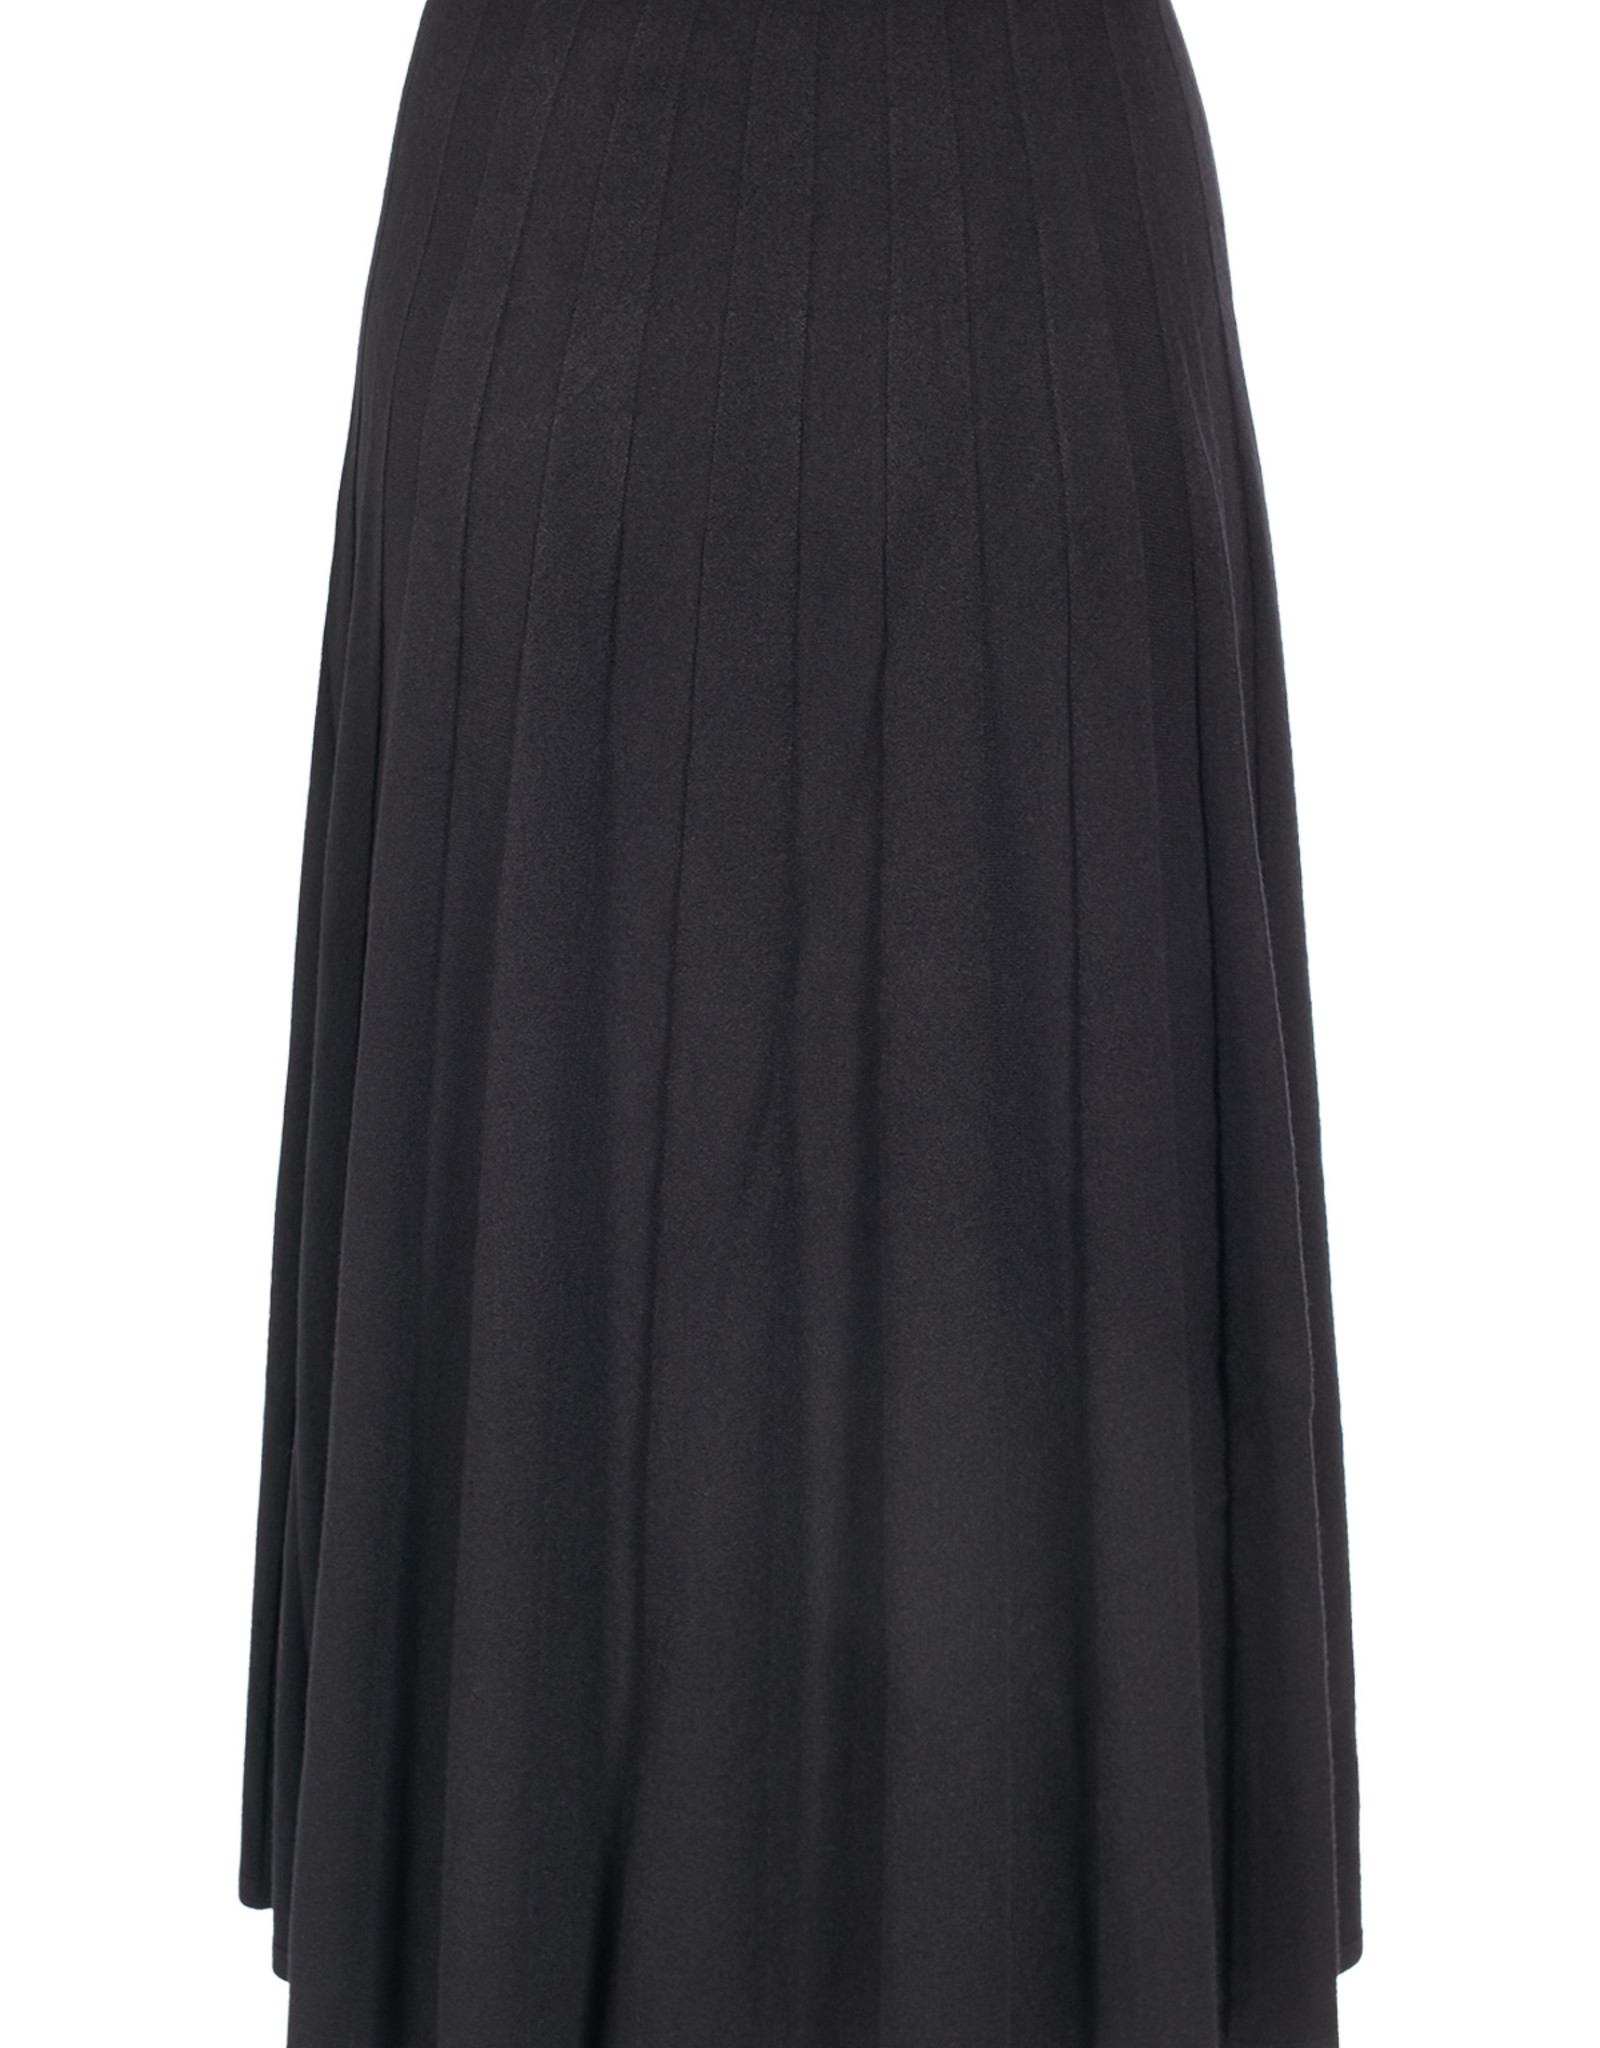 26409 Ruby Knitted Skirt